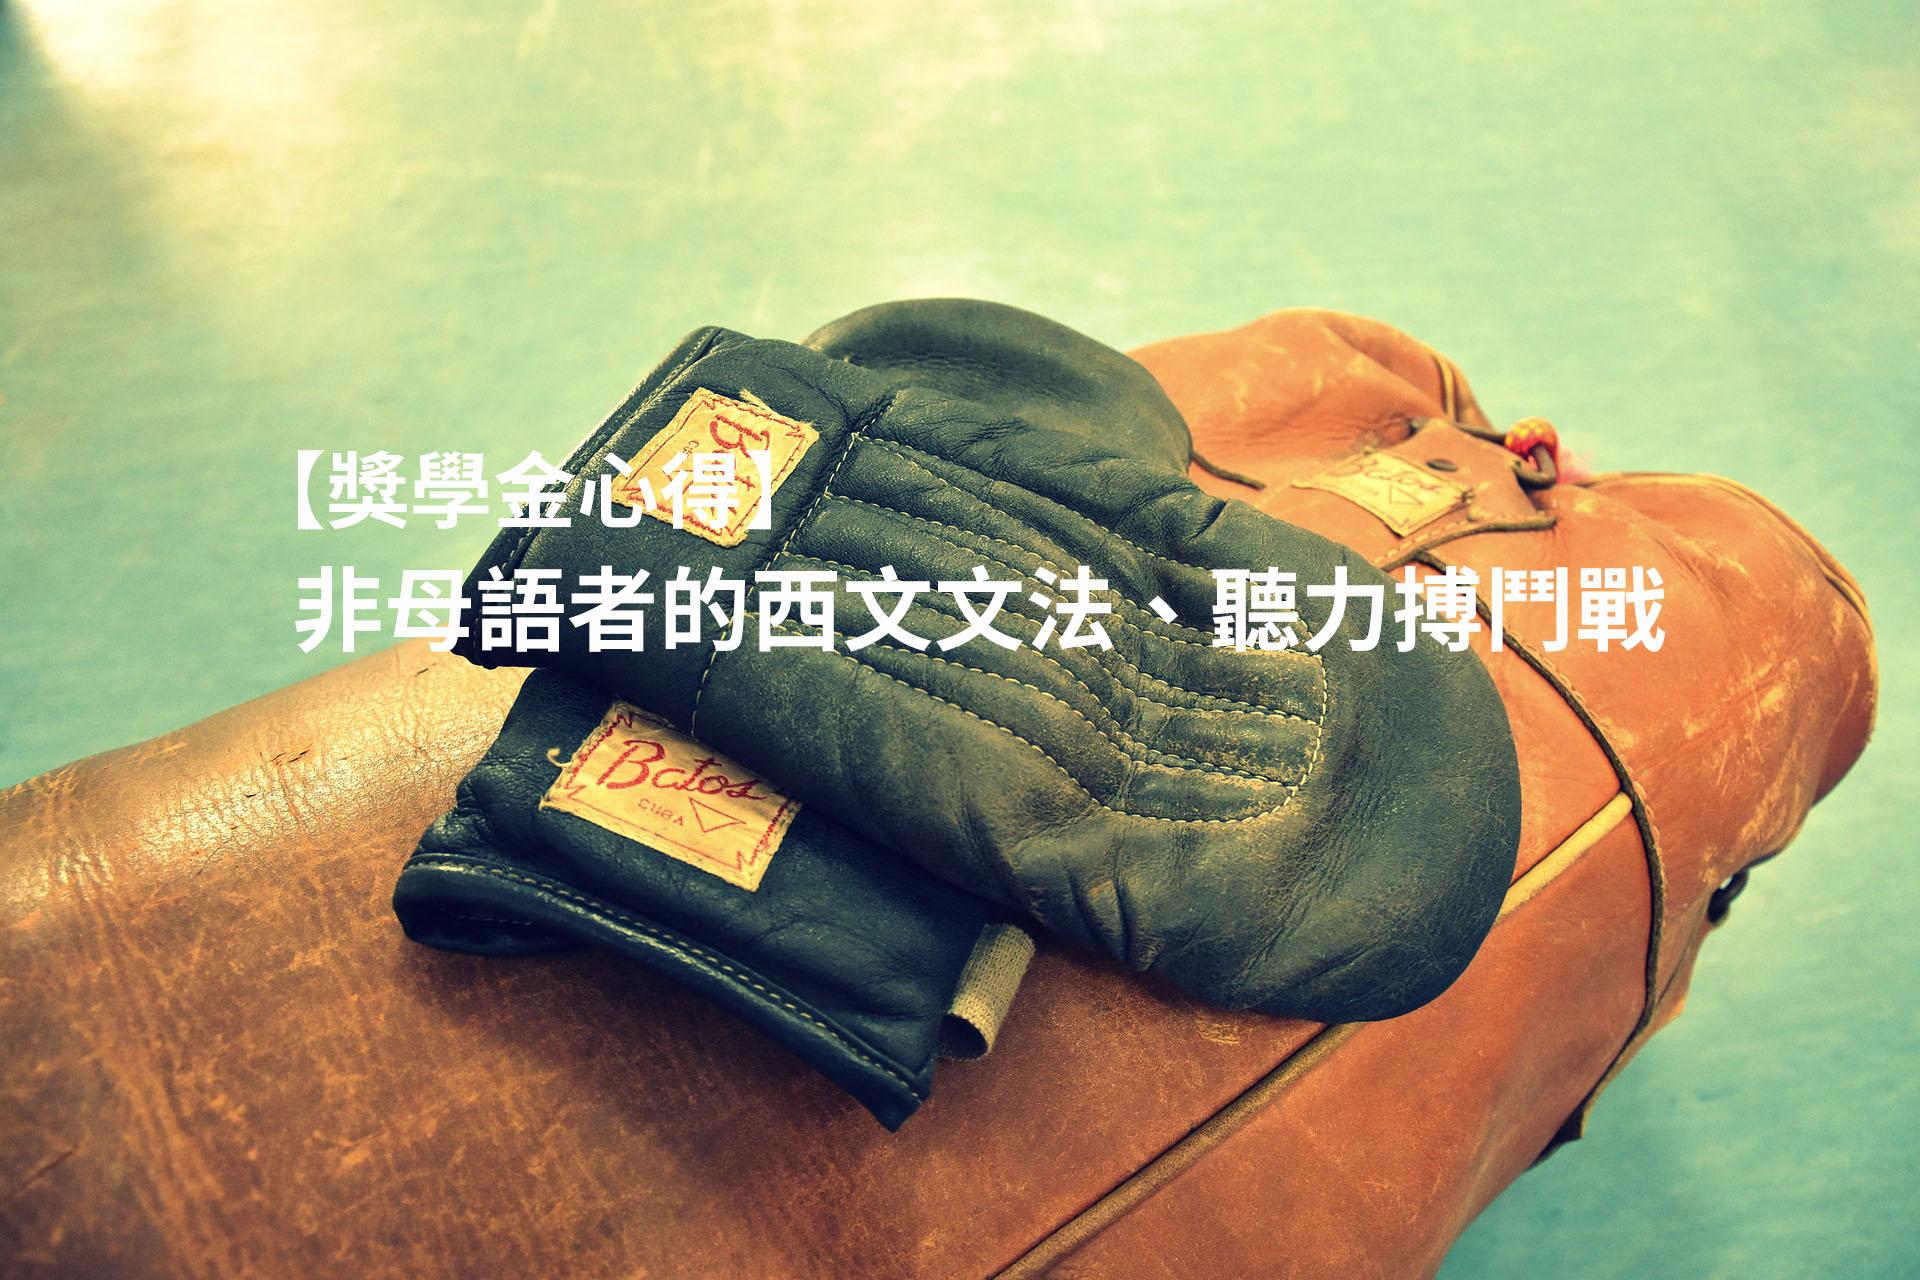 box-1609657_1920.jpg